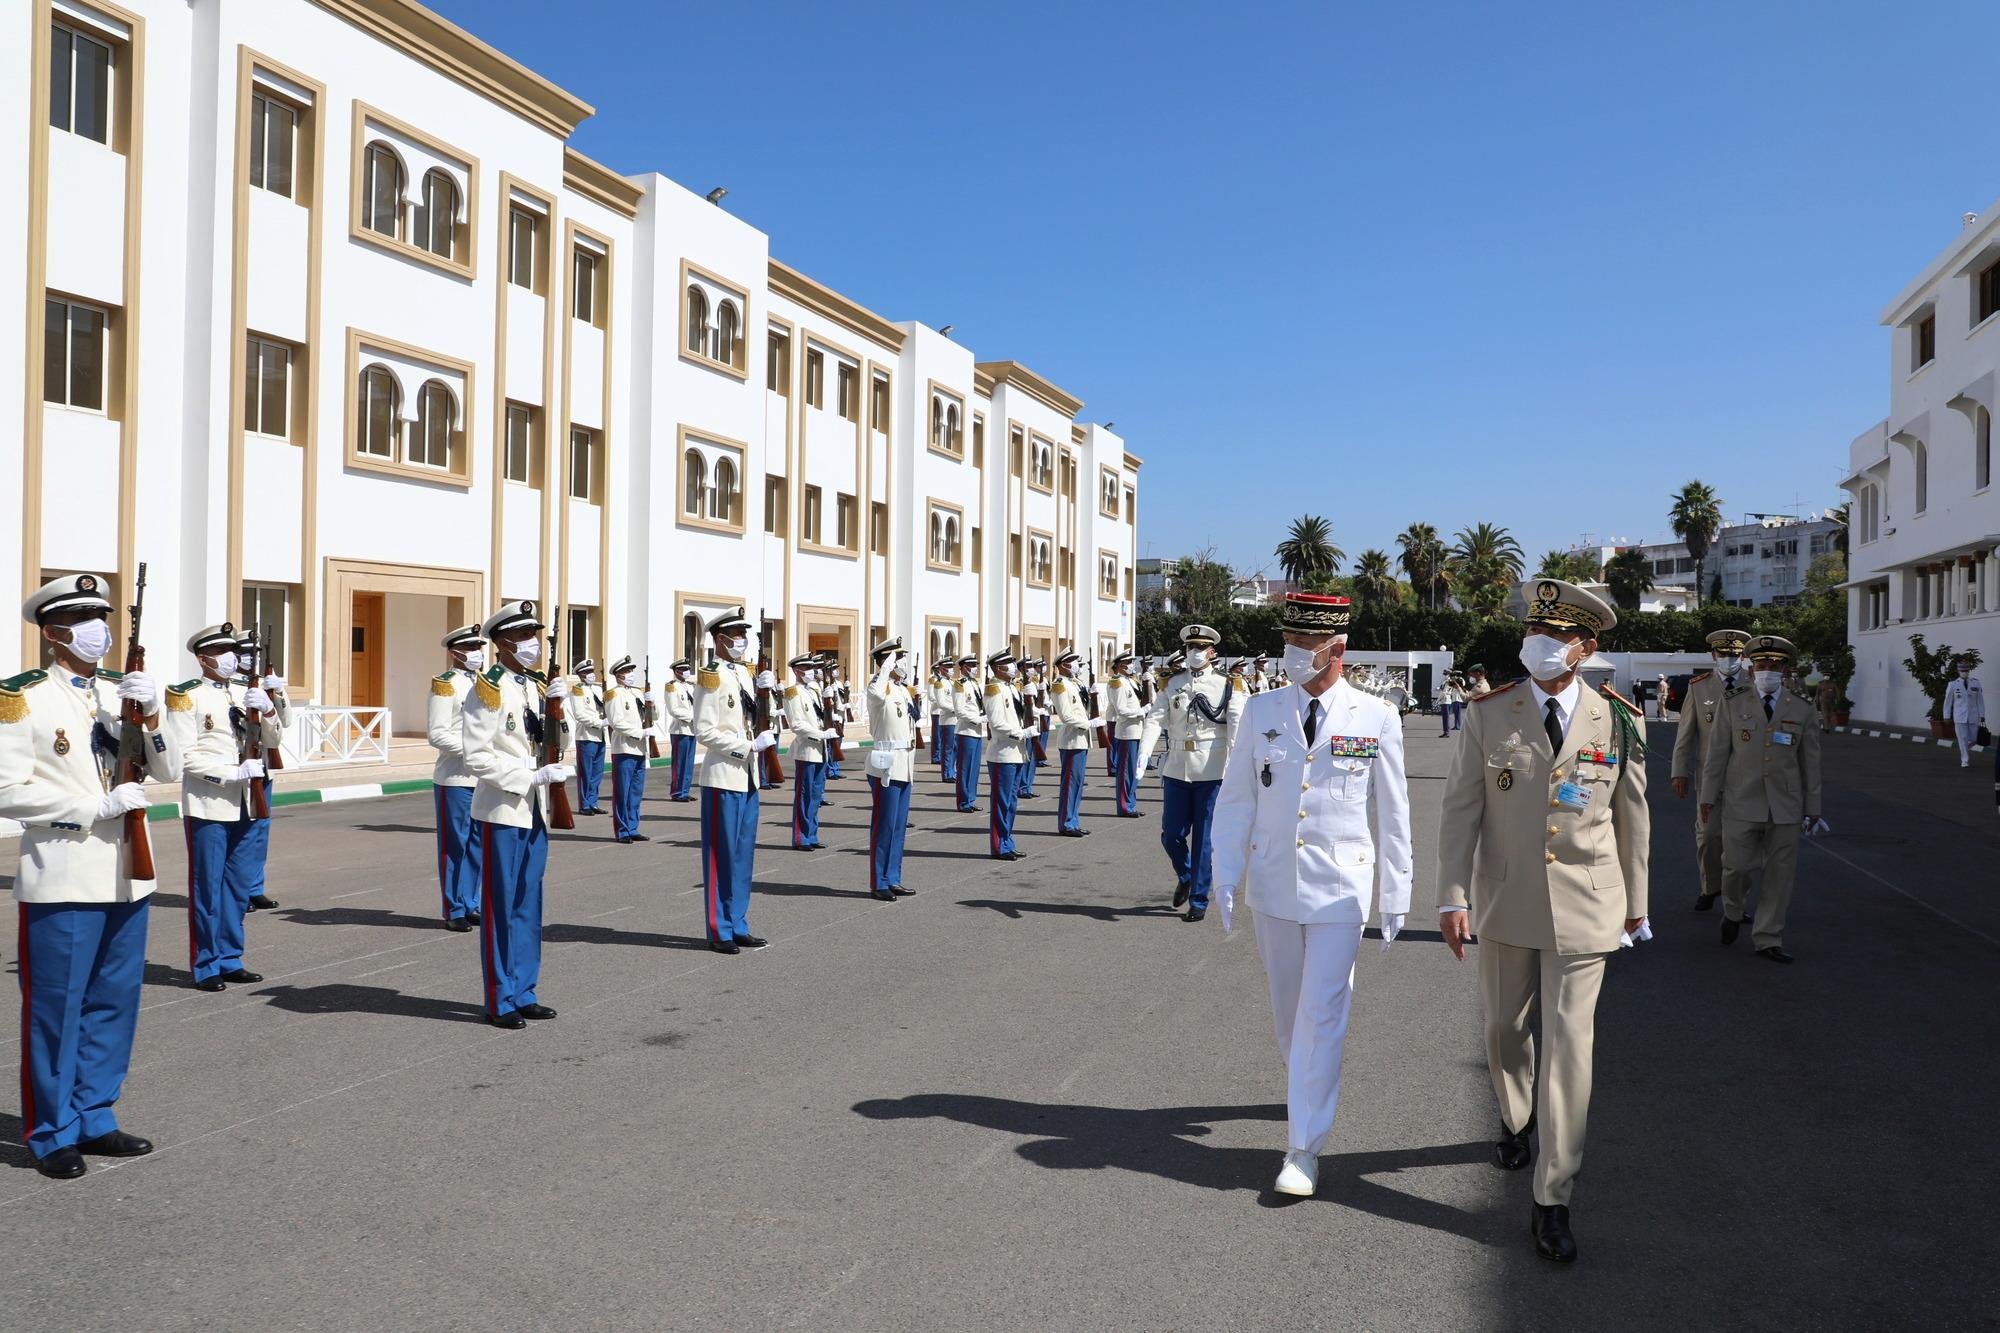 Coopération militaire Maroco - Française  - Page 5 Fr-00110